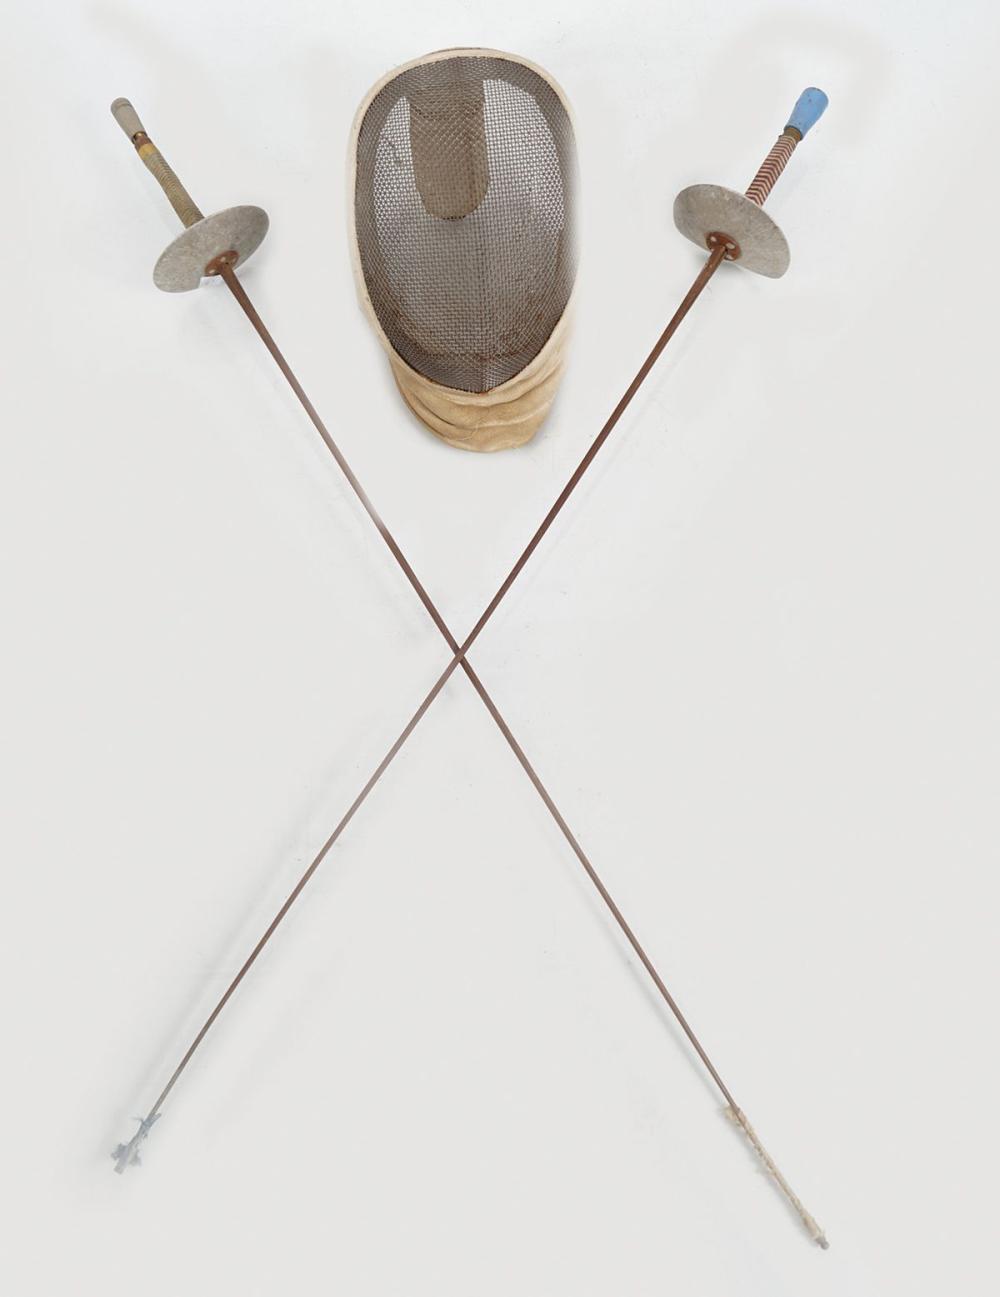 Lot 28: TWO FENCING SWORDS